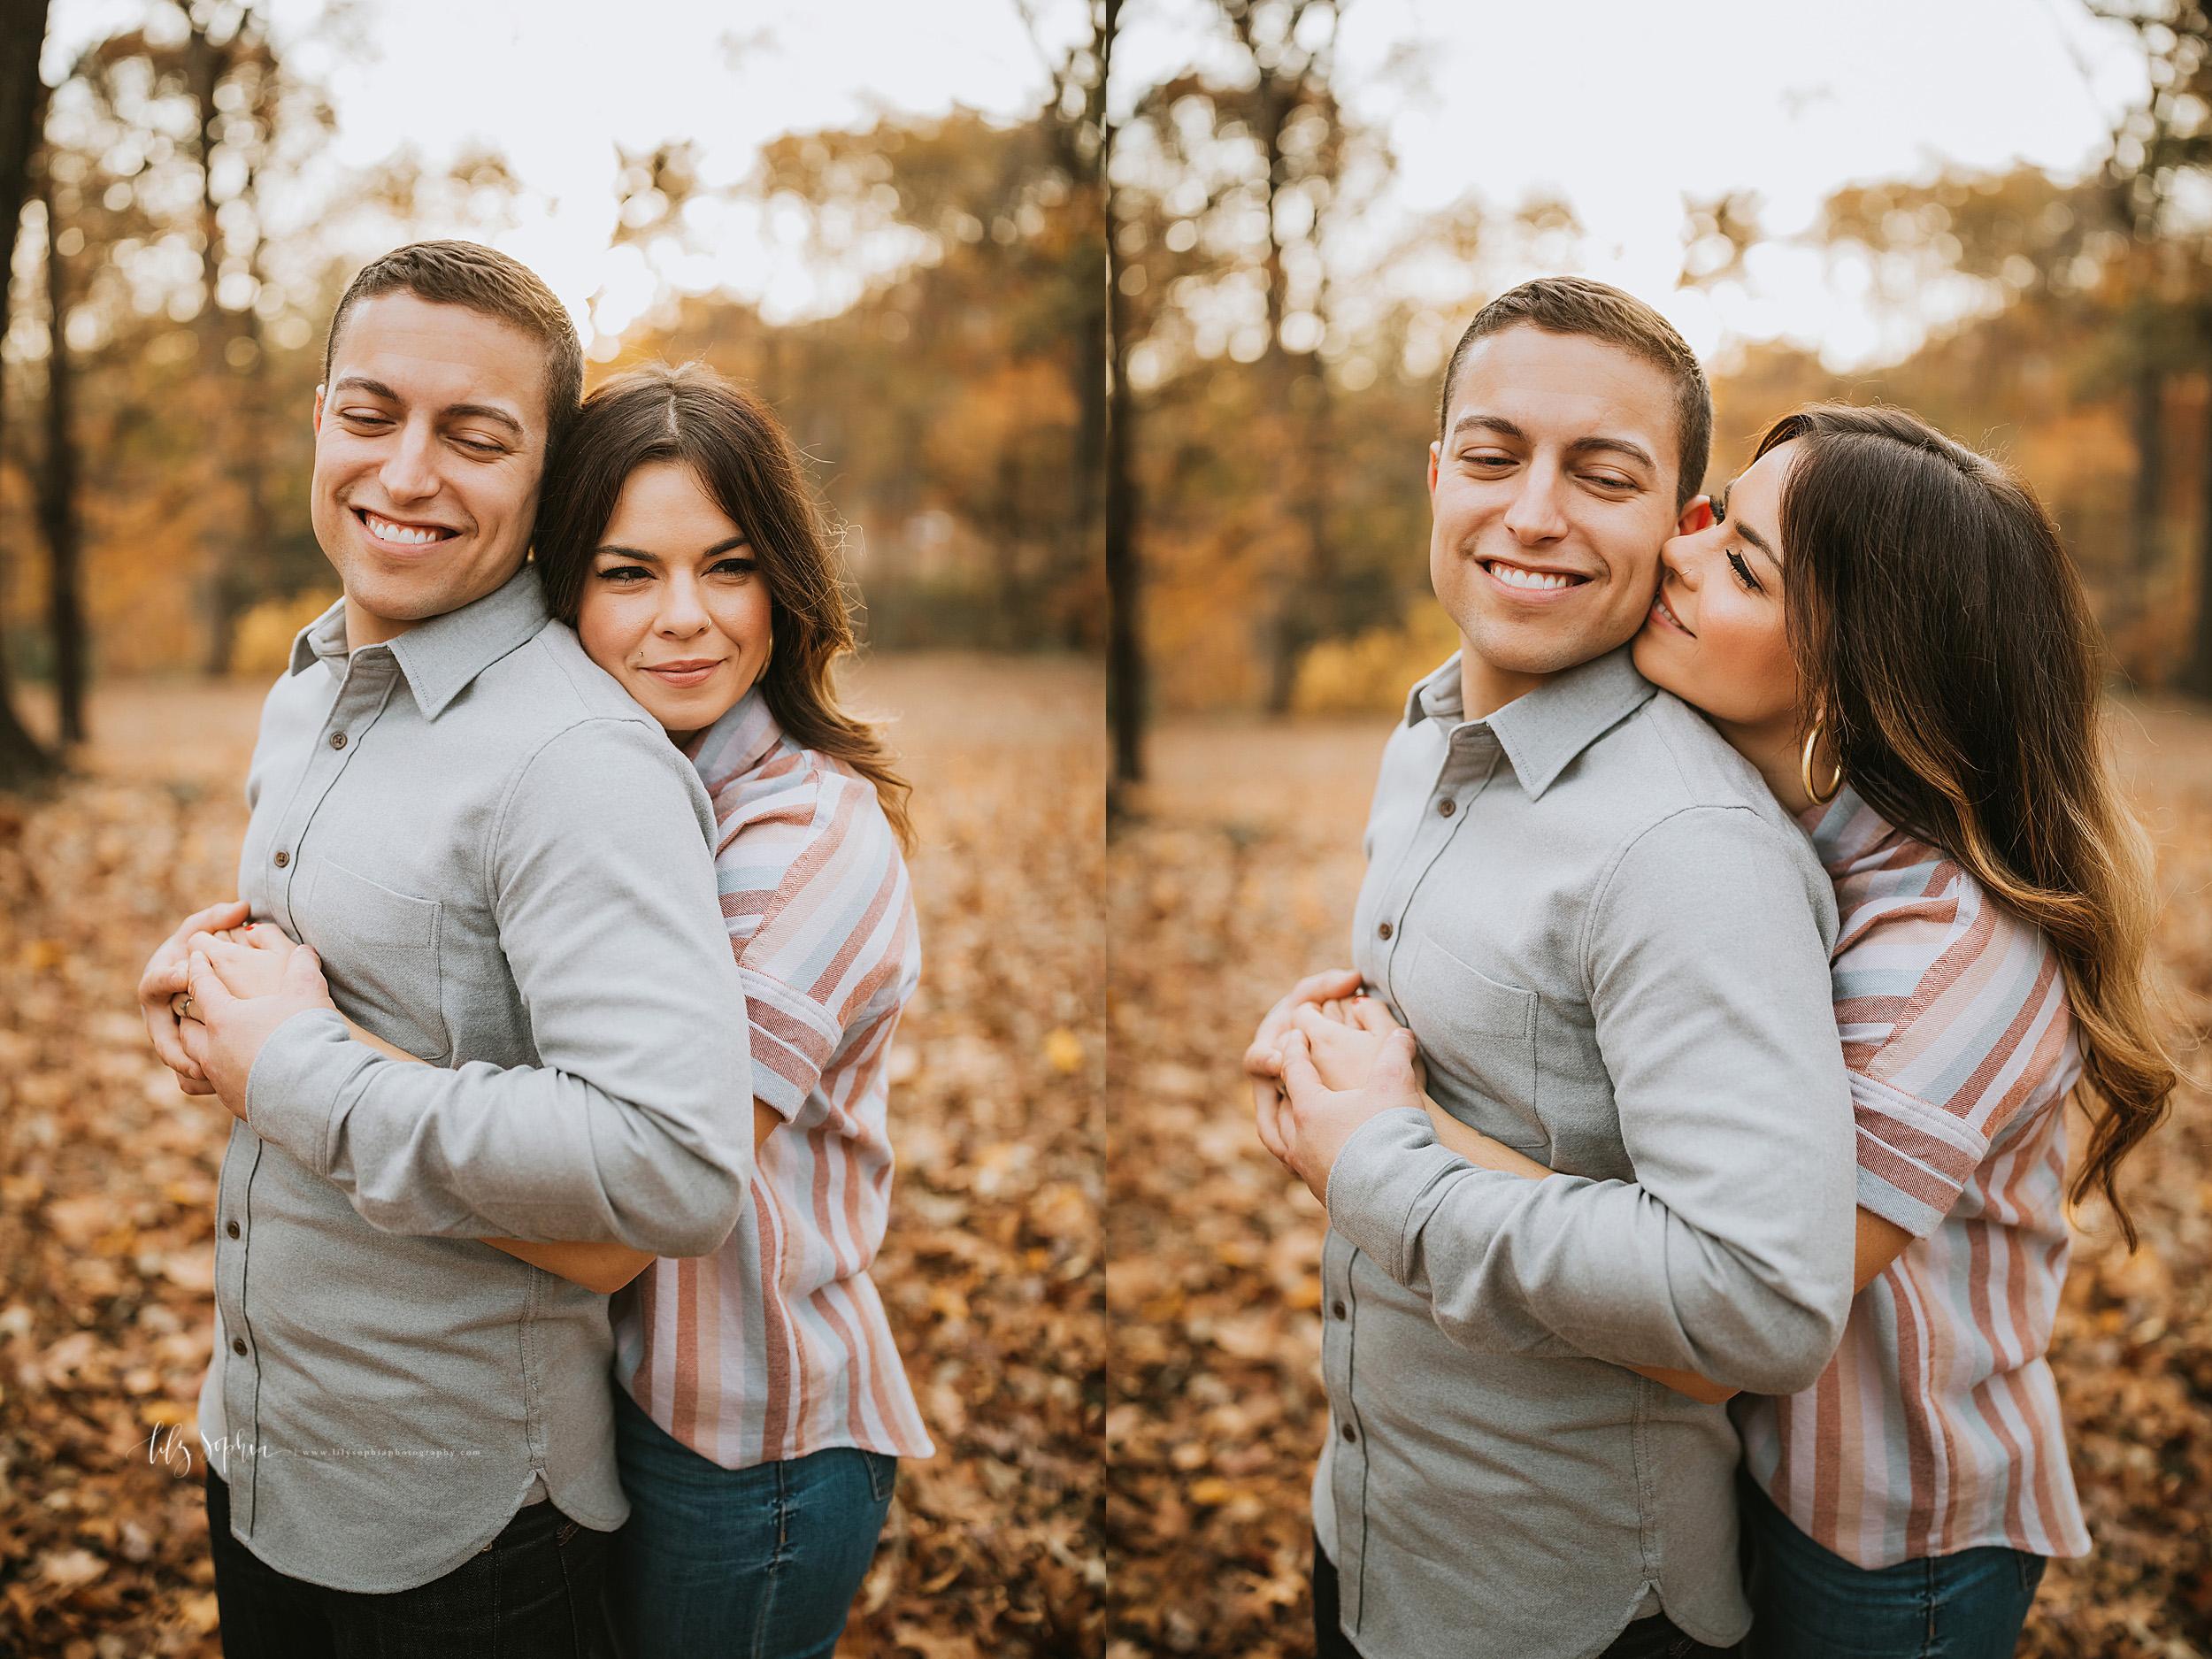 atlanta-reynoldstown-peoplestown-decatur-sandy-springs-buckhead-virginia-highlands-west-end-decatur-lily-sophia-photography-outdoor-fall-couples-photos_1478.jpg